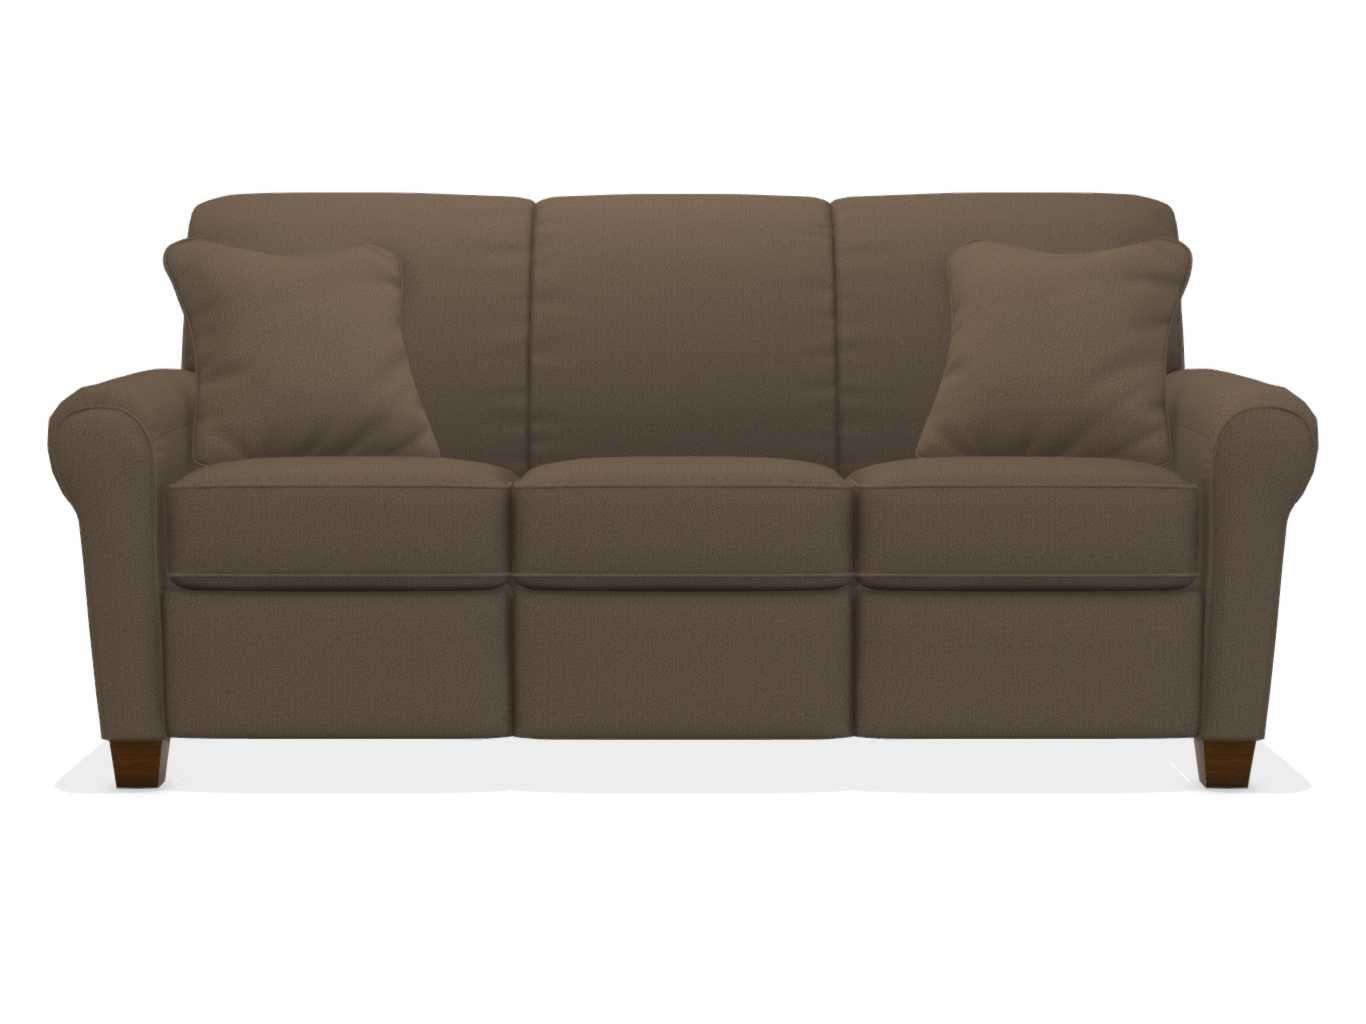 Bennett Duo® Reclining Sofa In 2020 | Reclining Sofa, Sofa In Bennett Power Reclining Sofas (View 12 of 15)